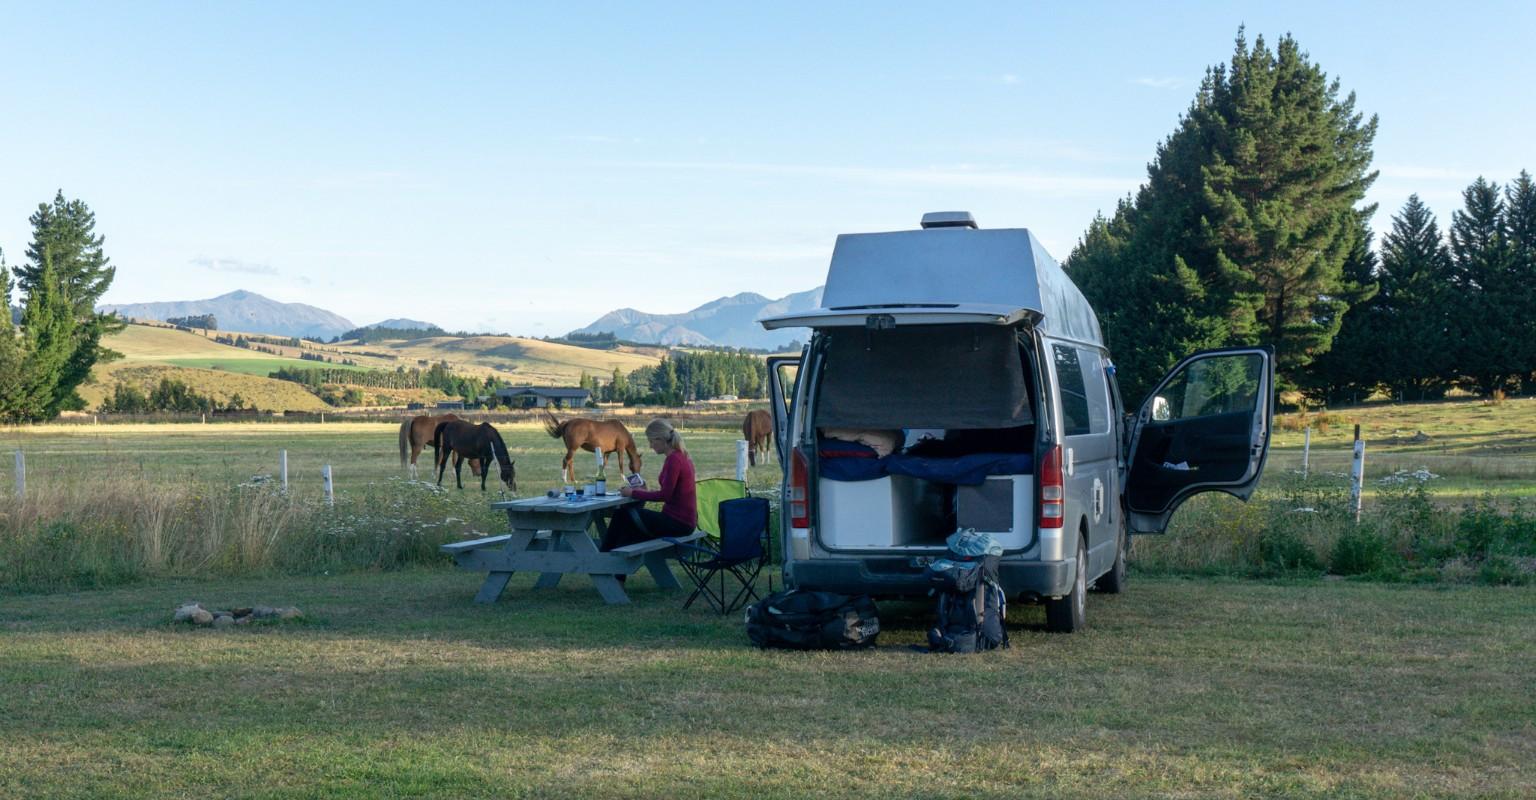 Camping Platz bei Te Anau